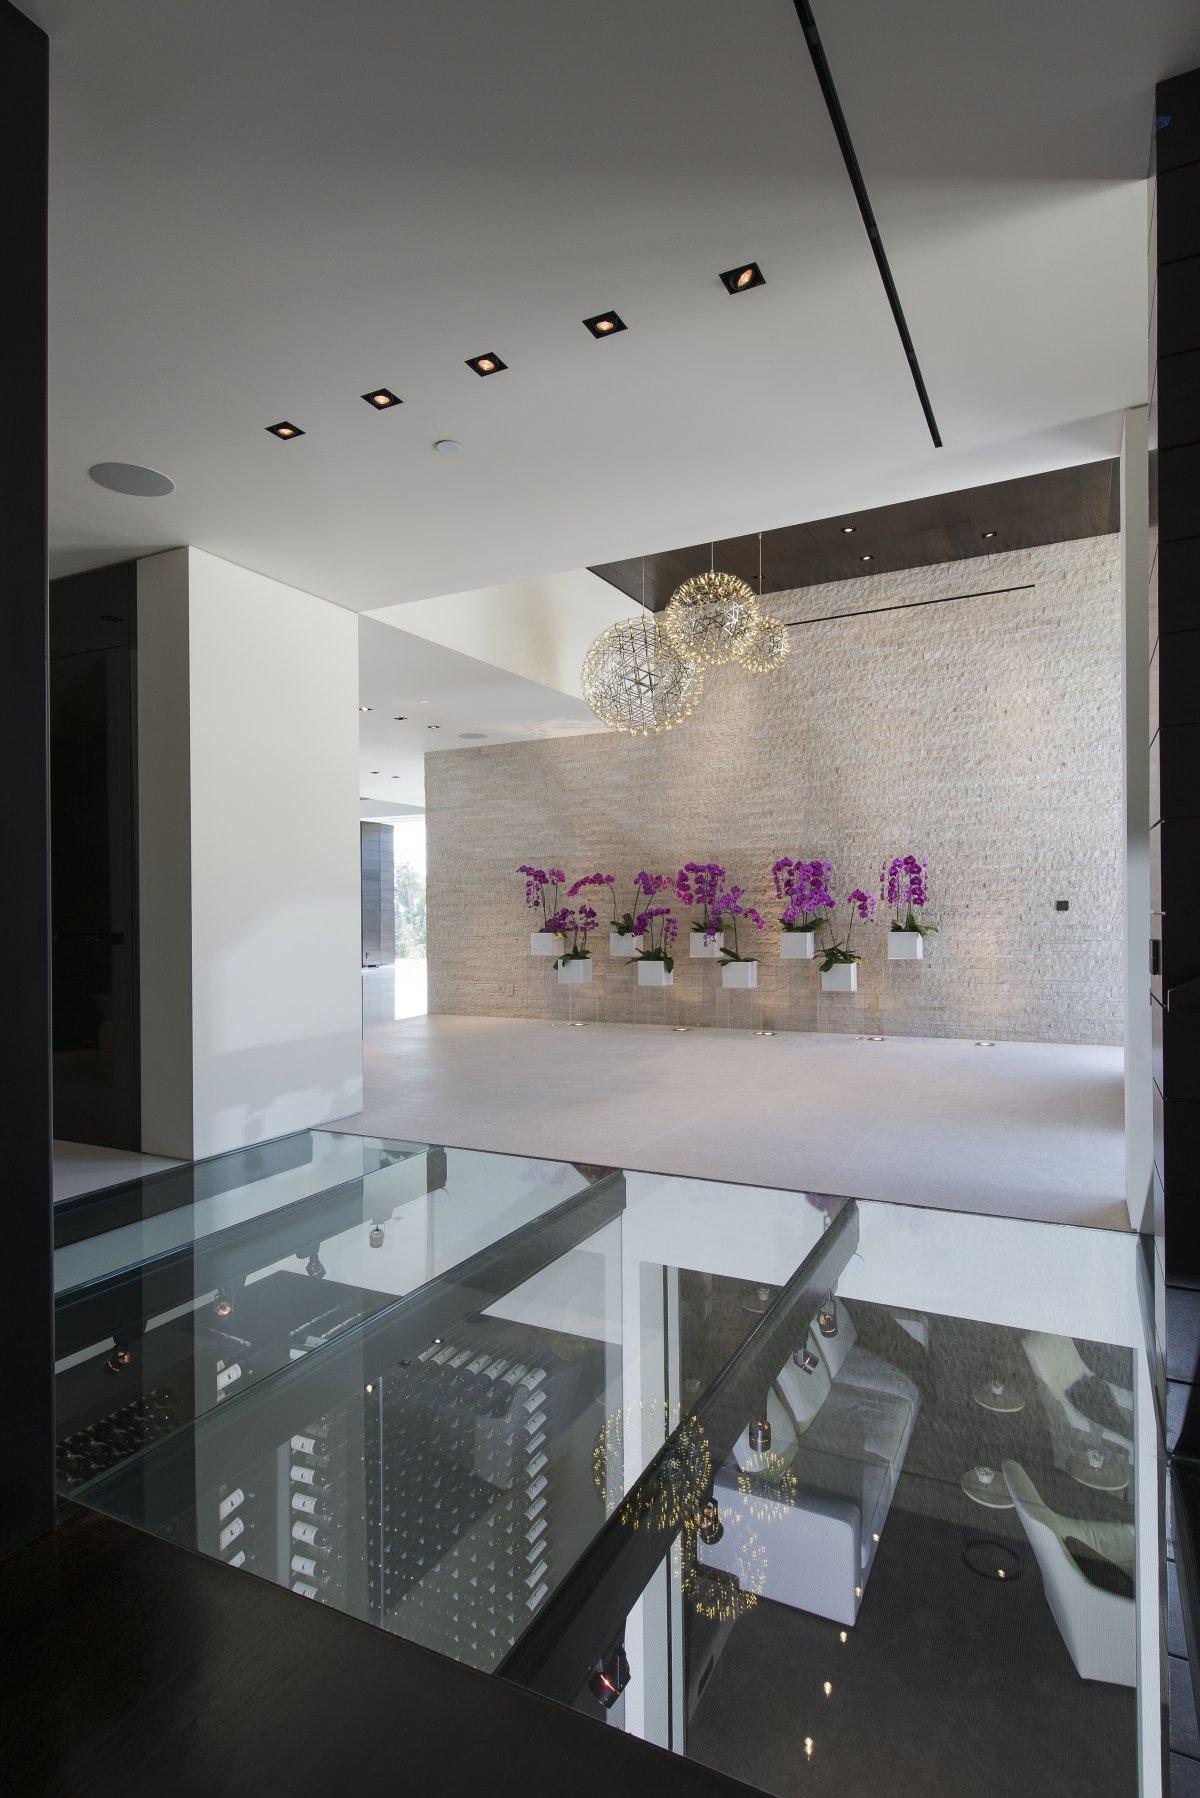 Whipple Russell Architects, Laurel Way, особняк в Беверли Хиллз, особняк в Калифорнии, дом с видом на Лос Анджелес, особняки кинозвезд, дом в Голливуде